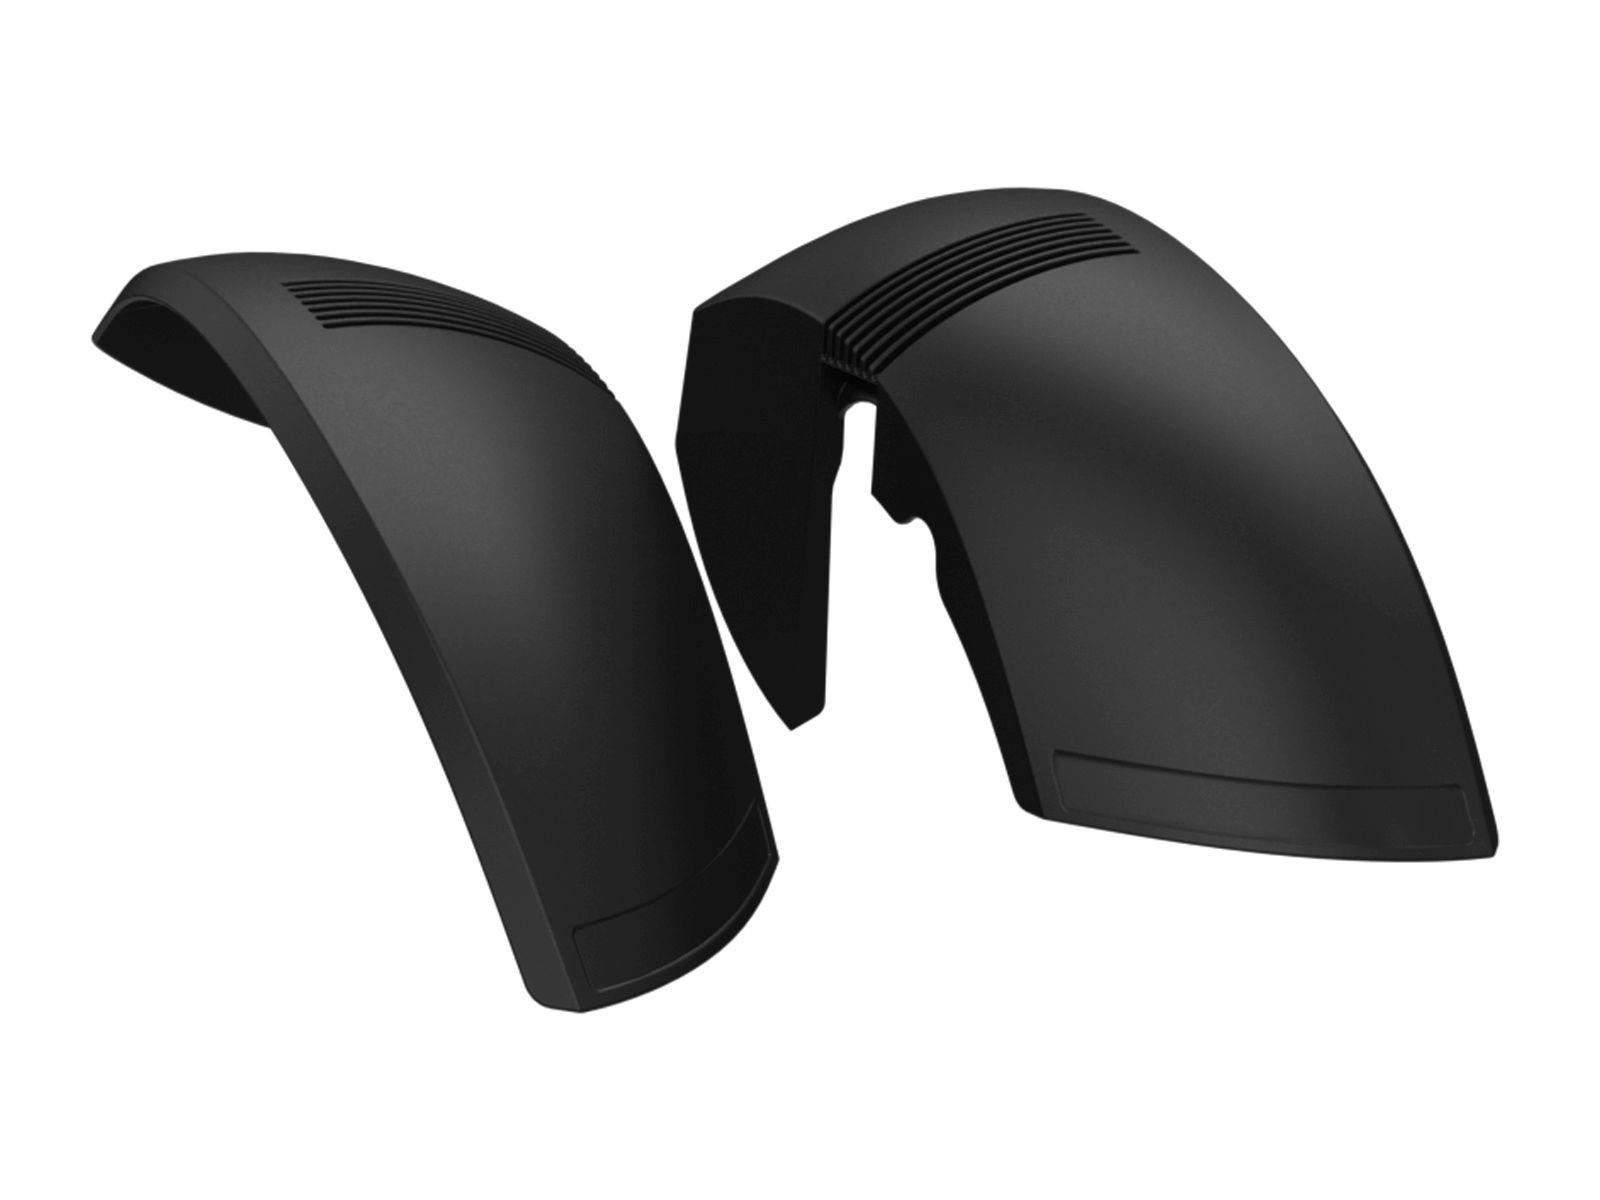 XL Frame - Rear mudguards 71° black